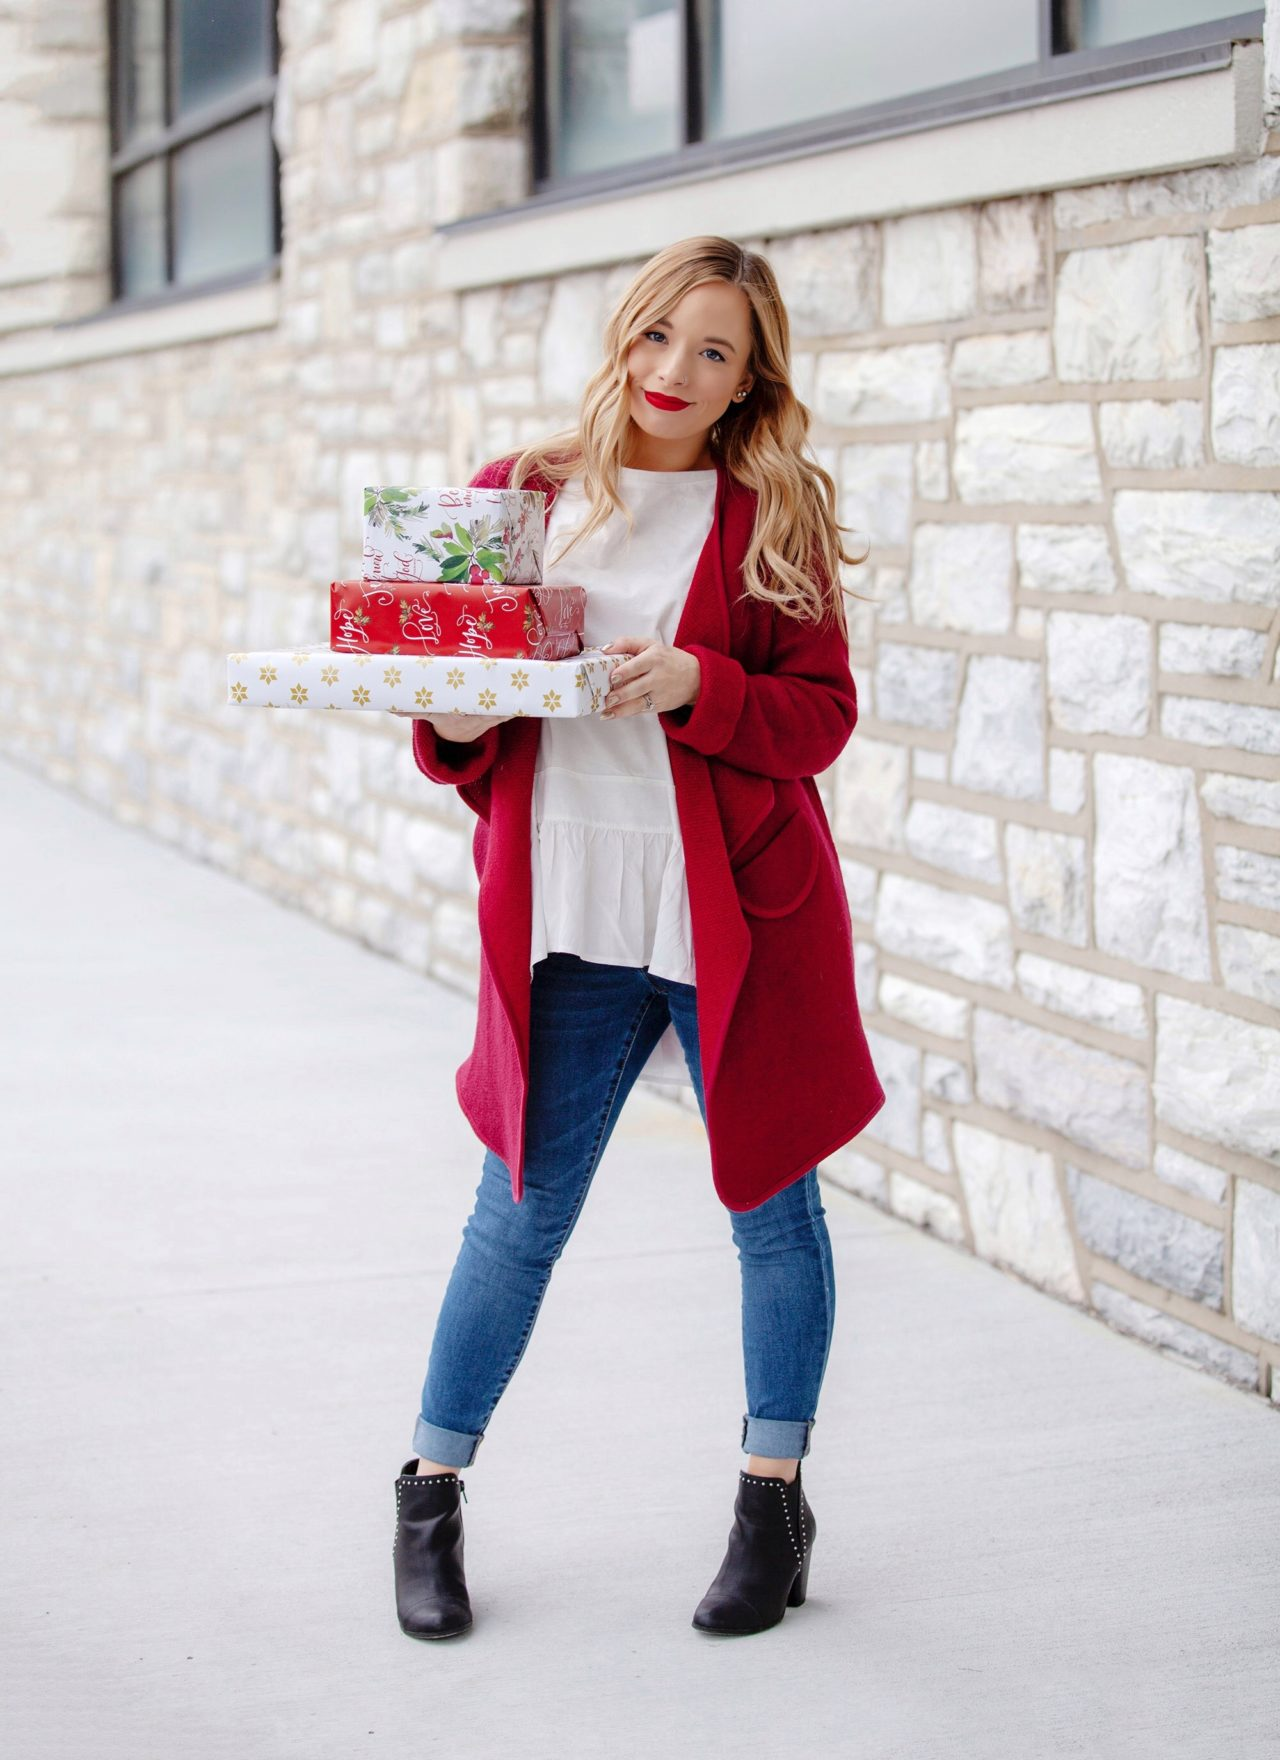 Blogger Christmas Photo